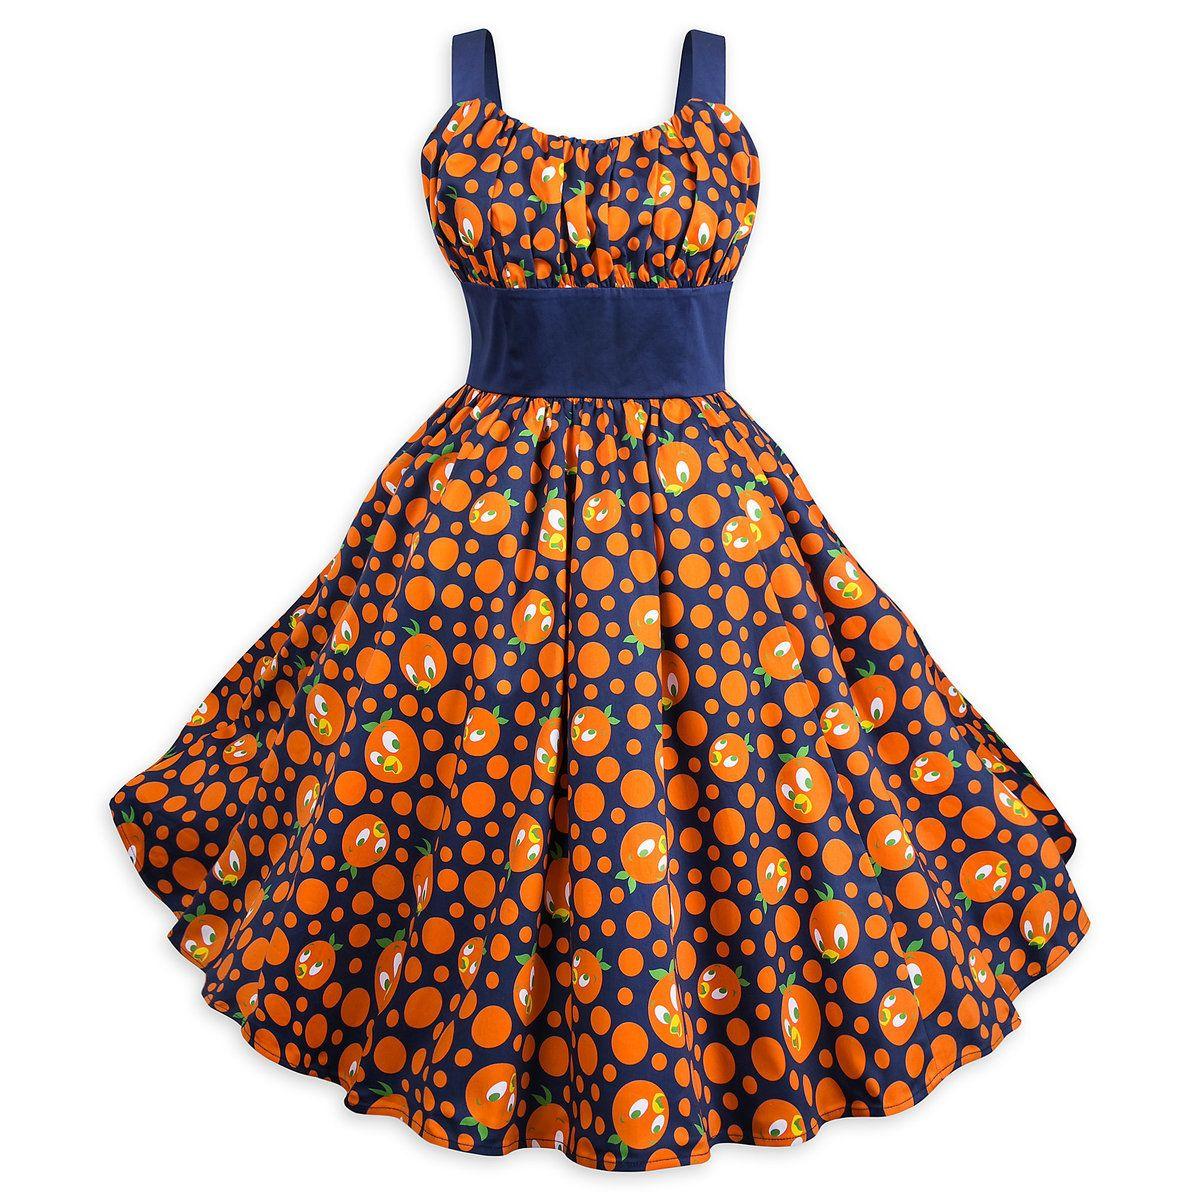 Orange Bird Dress For Women Shopdisney Bird Dress Womens Dresses Disney Dresses [ 1200 x 1200 Pixel ]